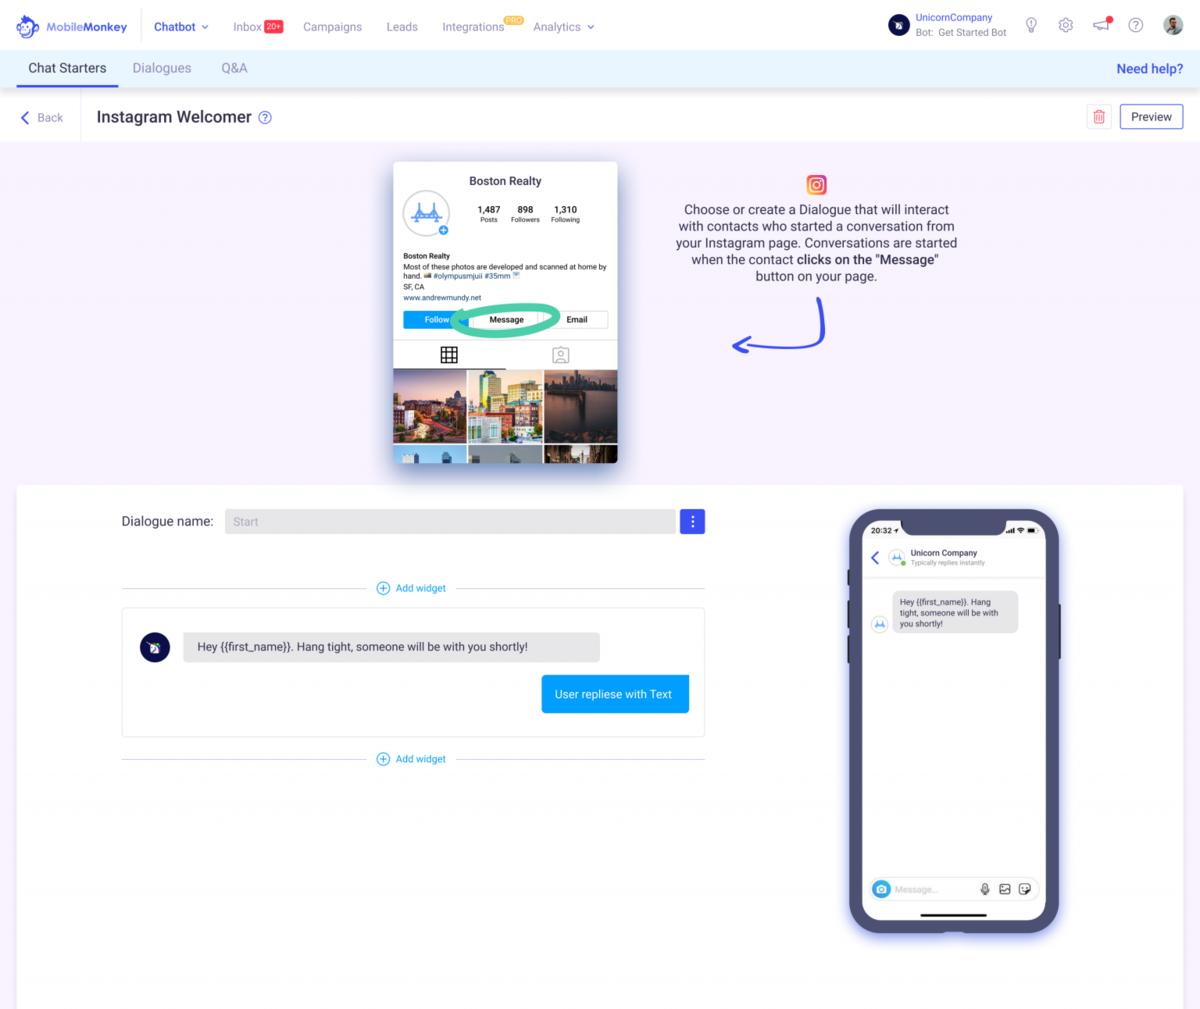 Instagram Messenger Marketing Automation Tools